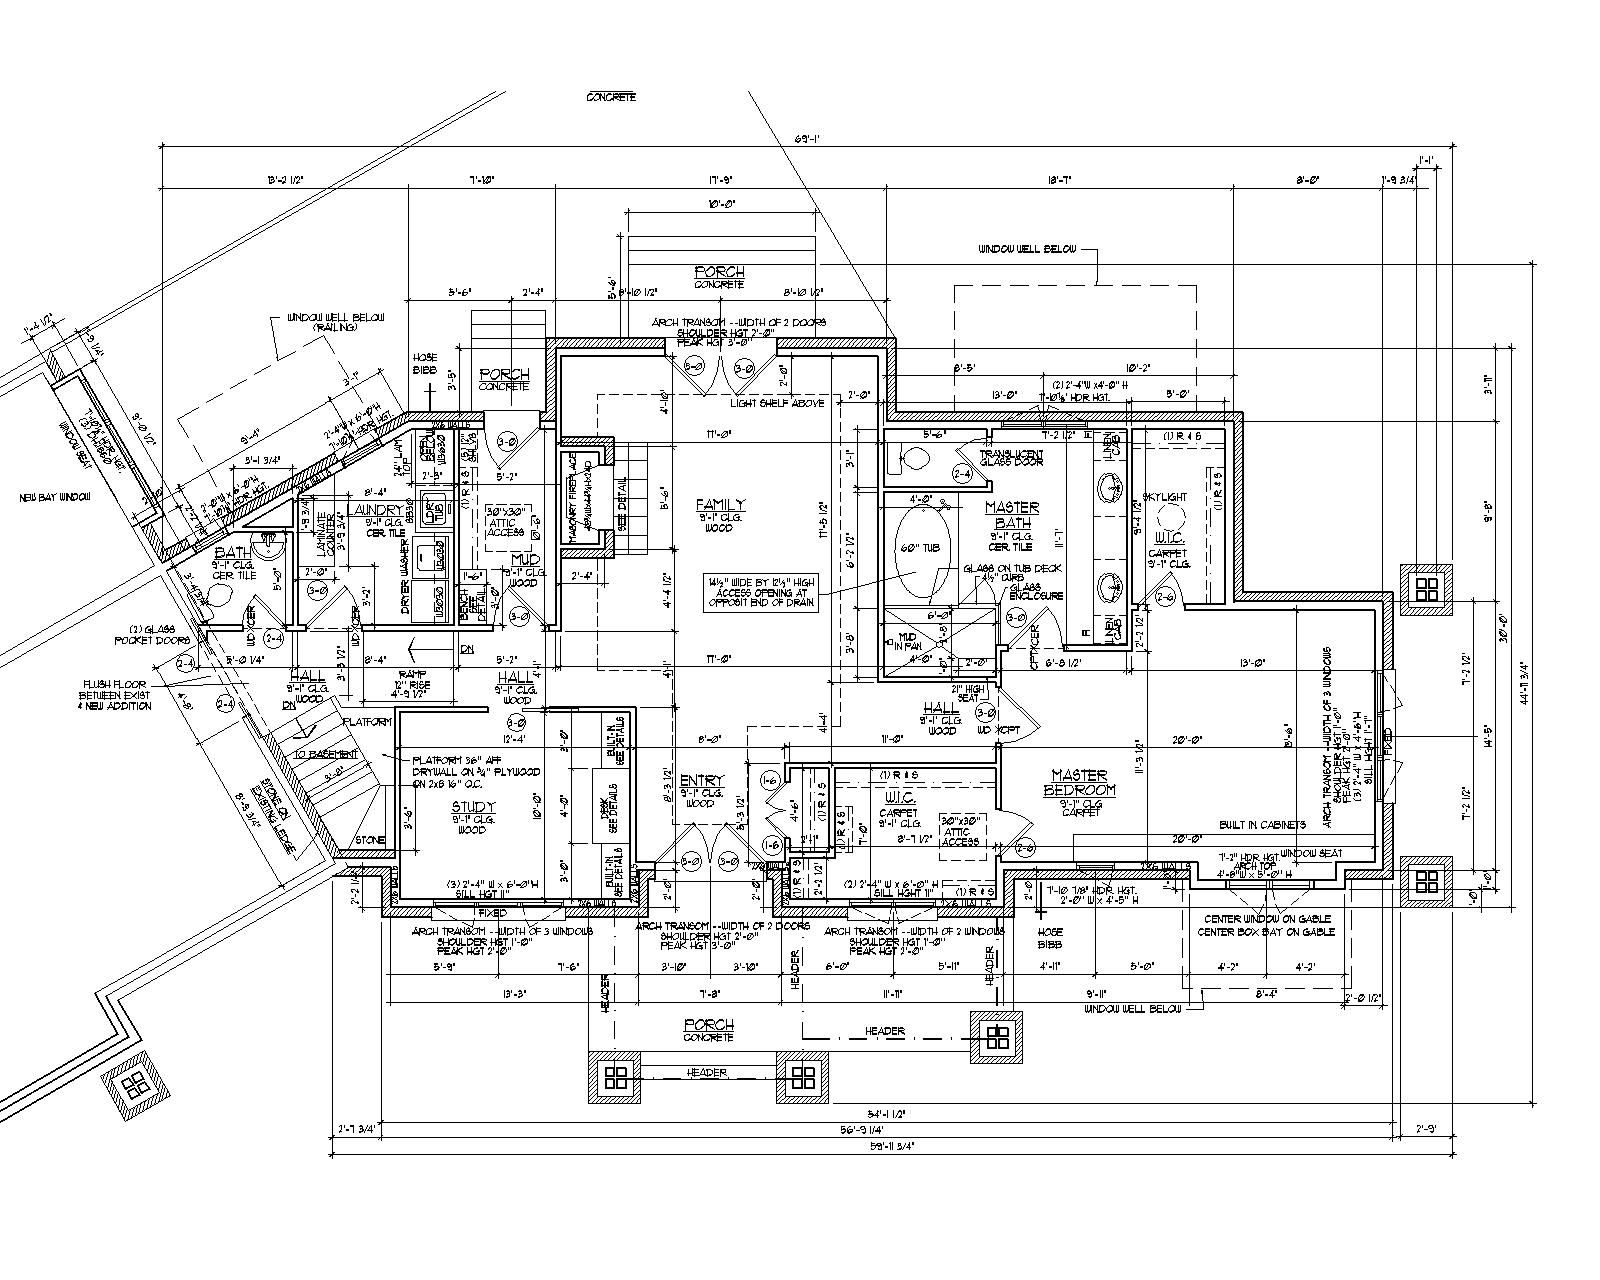 Architectural Cad Drawings Bingbingwang Pinterest Drawing Plans Loft  Conversion House Extension | Home Design Idea | Pinterest | Cad Drawing, ...